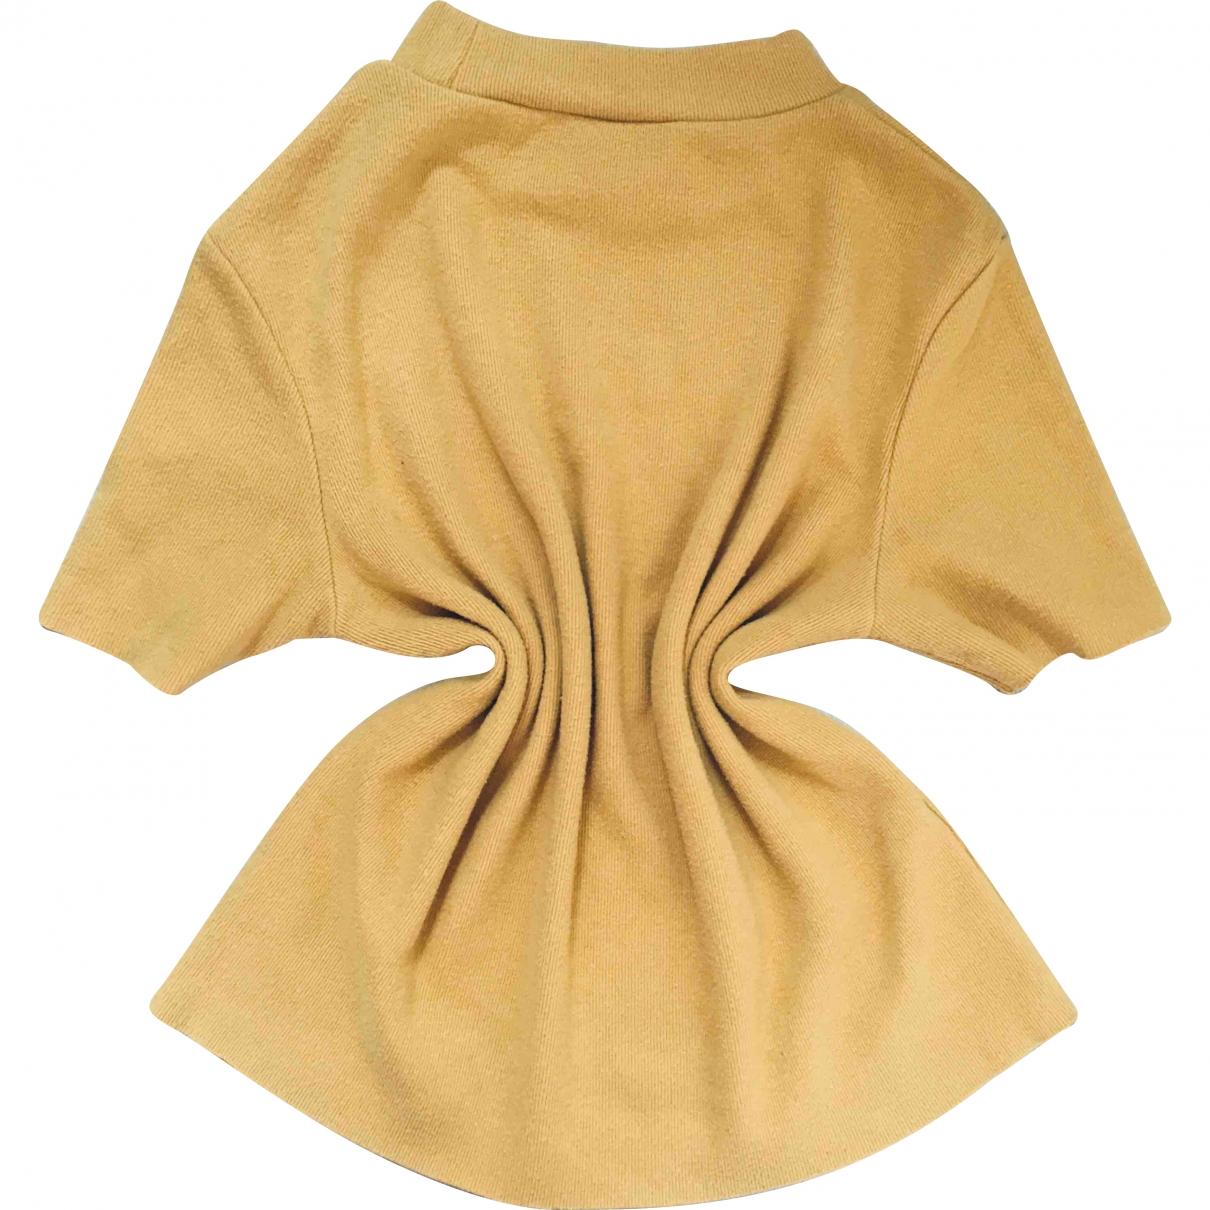 Zara \N Yellow Wool  top for Women M International